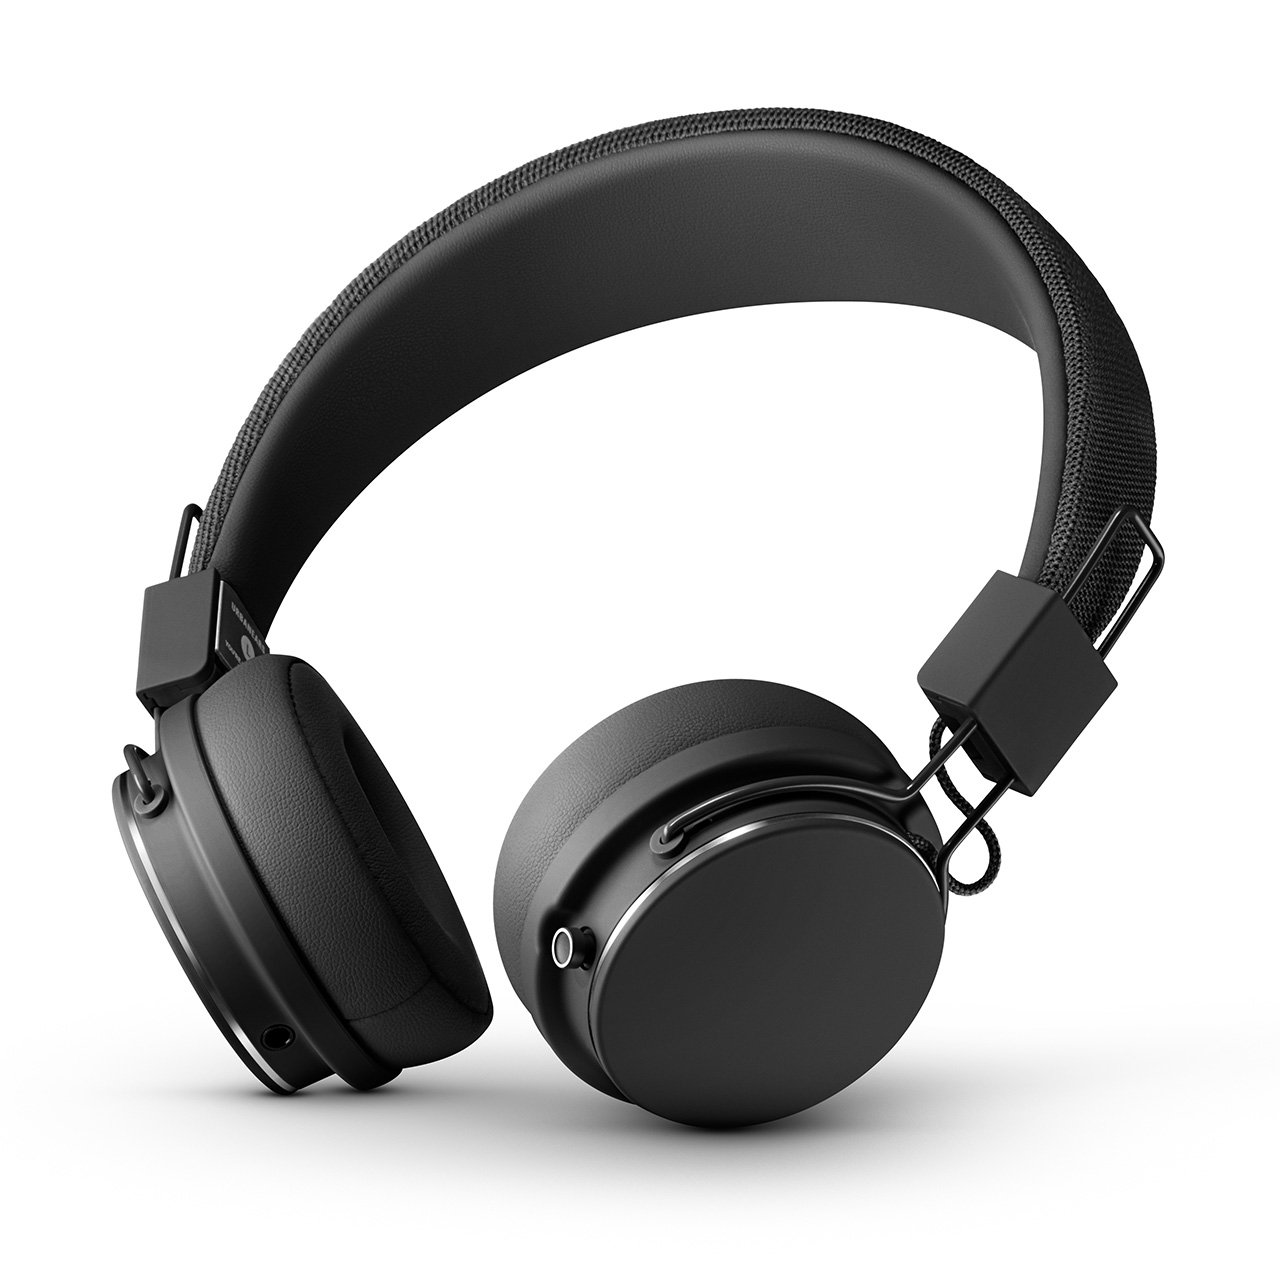 Bluetooth sluchátka Plattan II BT – Black